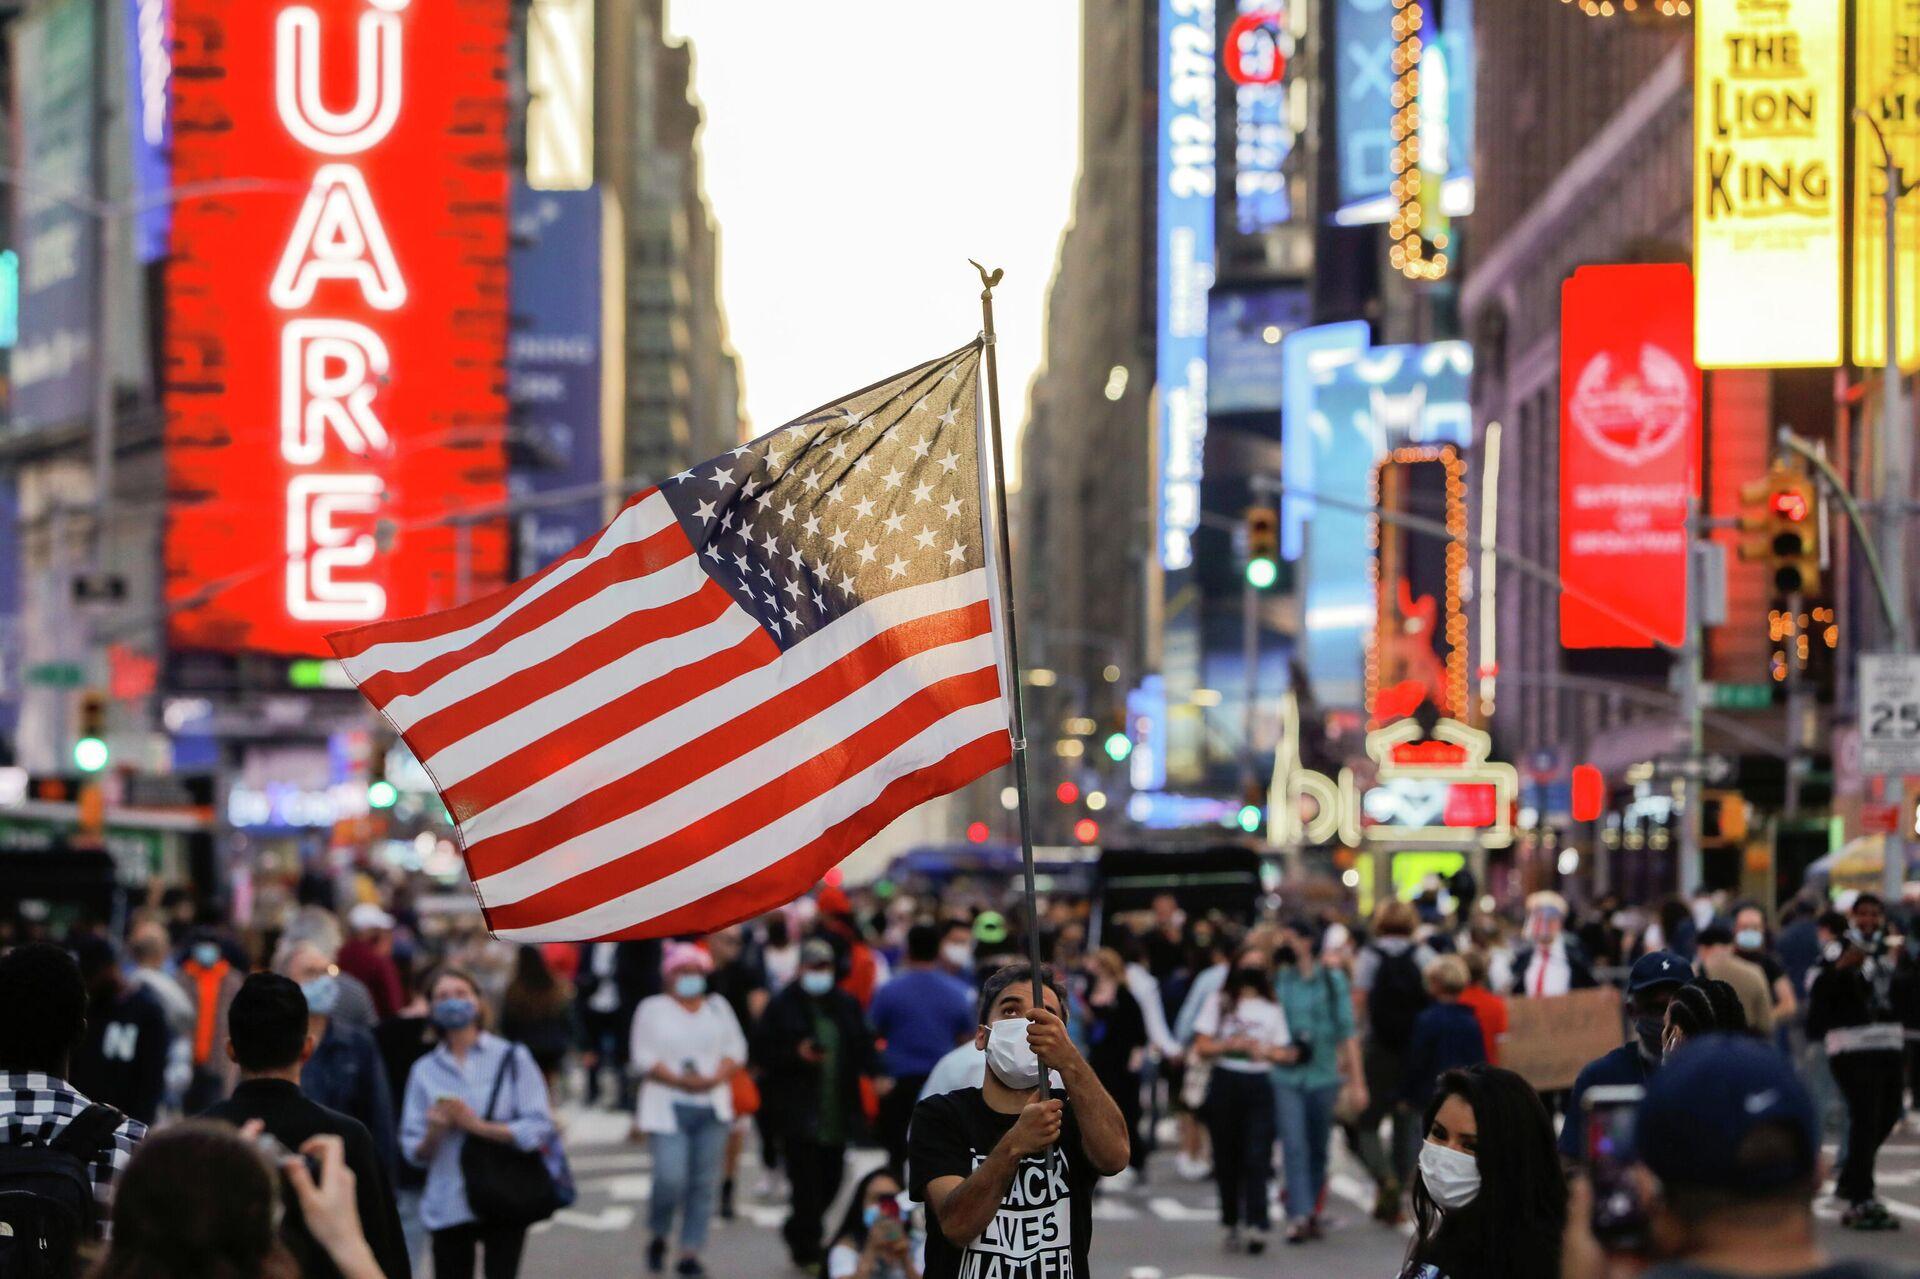 Мужчина с флагом США на Таймс-сквер в Нью-Йорке - РИА Новости, 1920, 14.12.2020